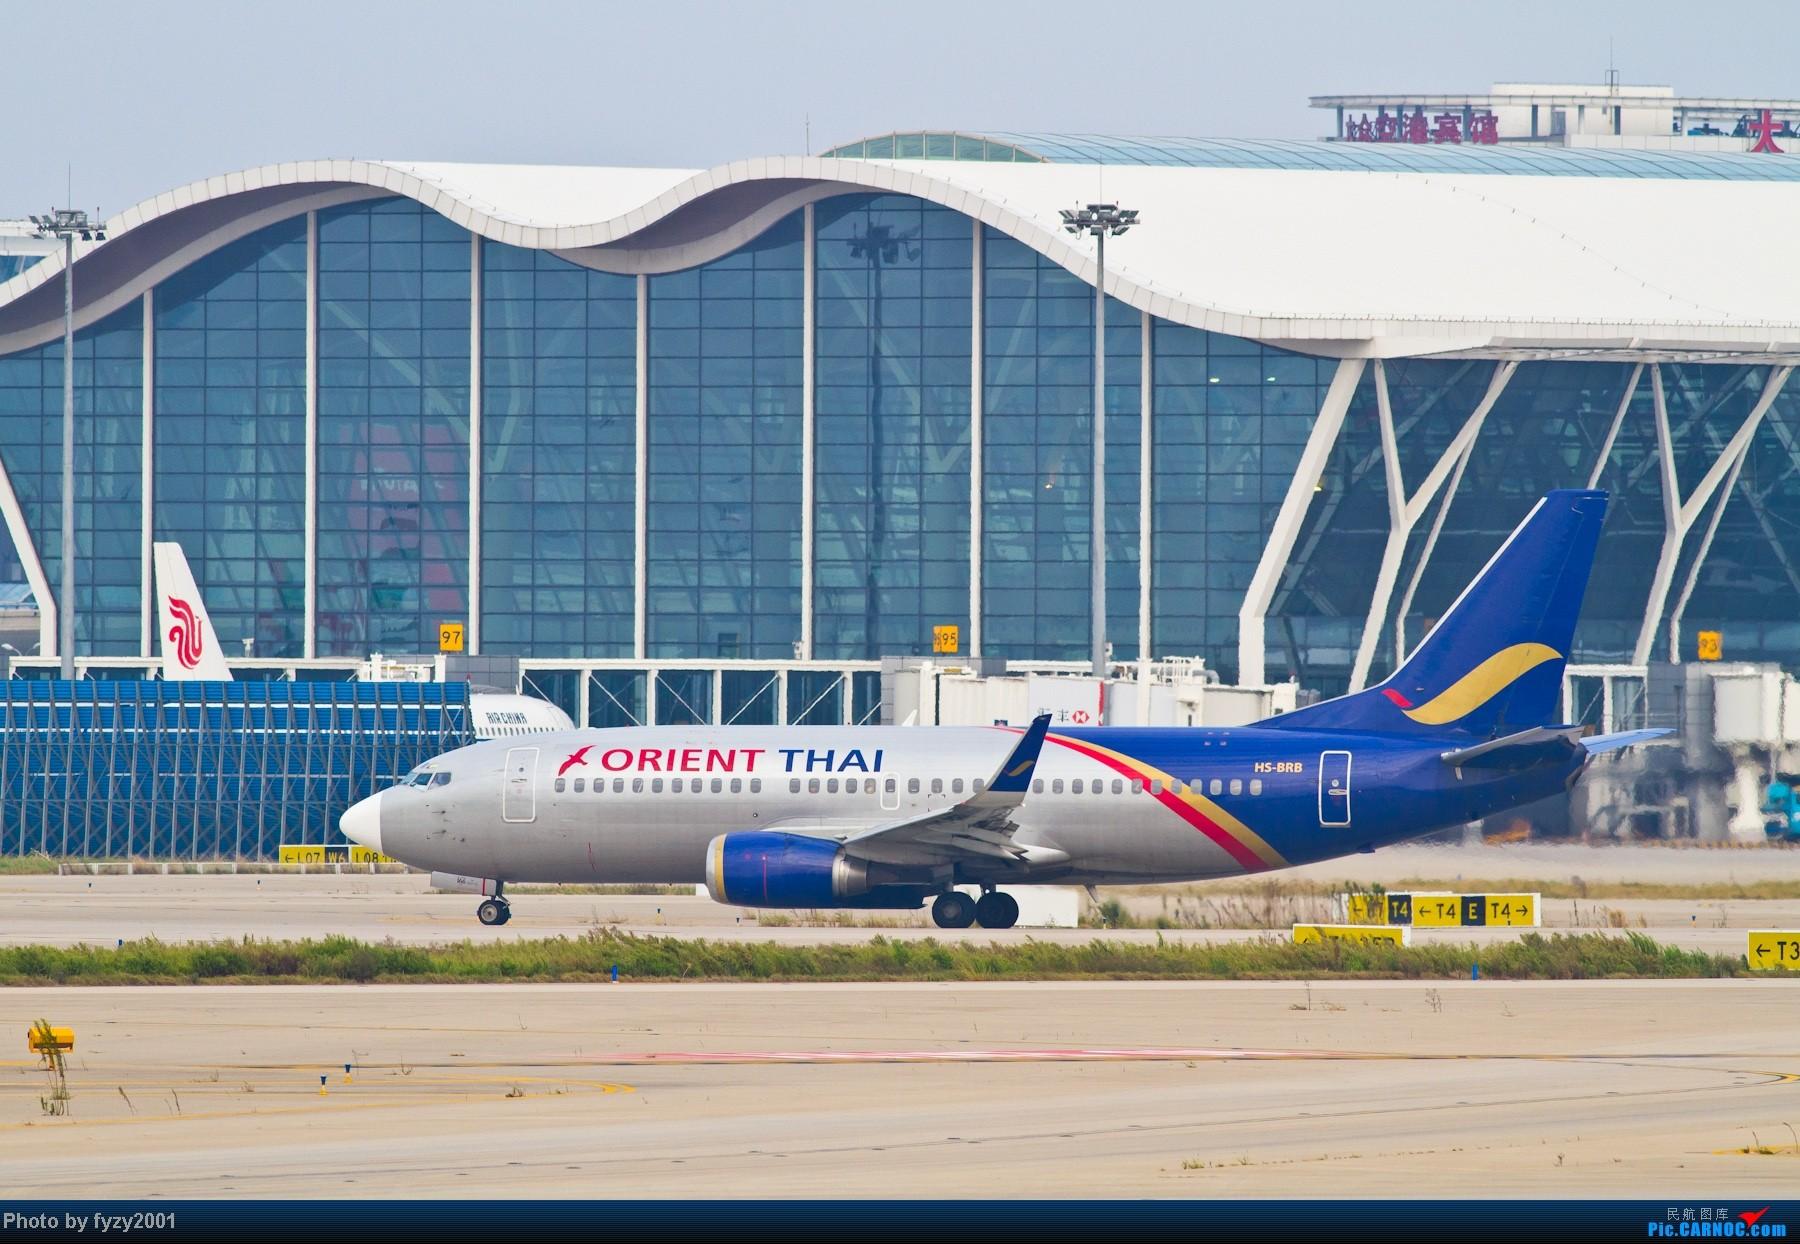 Re:[原创][无锡西站]长假PVG蹲守~~~~只发大图,多图杀猫~~~~ BOEING 737-300 HS-BRB 中国上海浦东机场